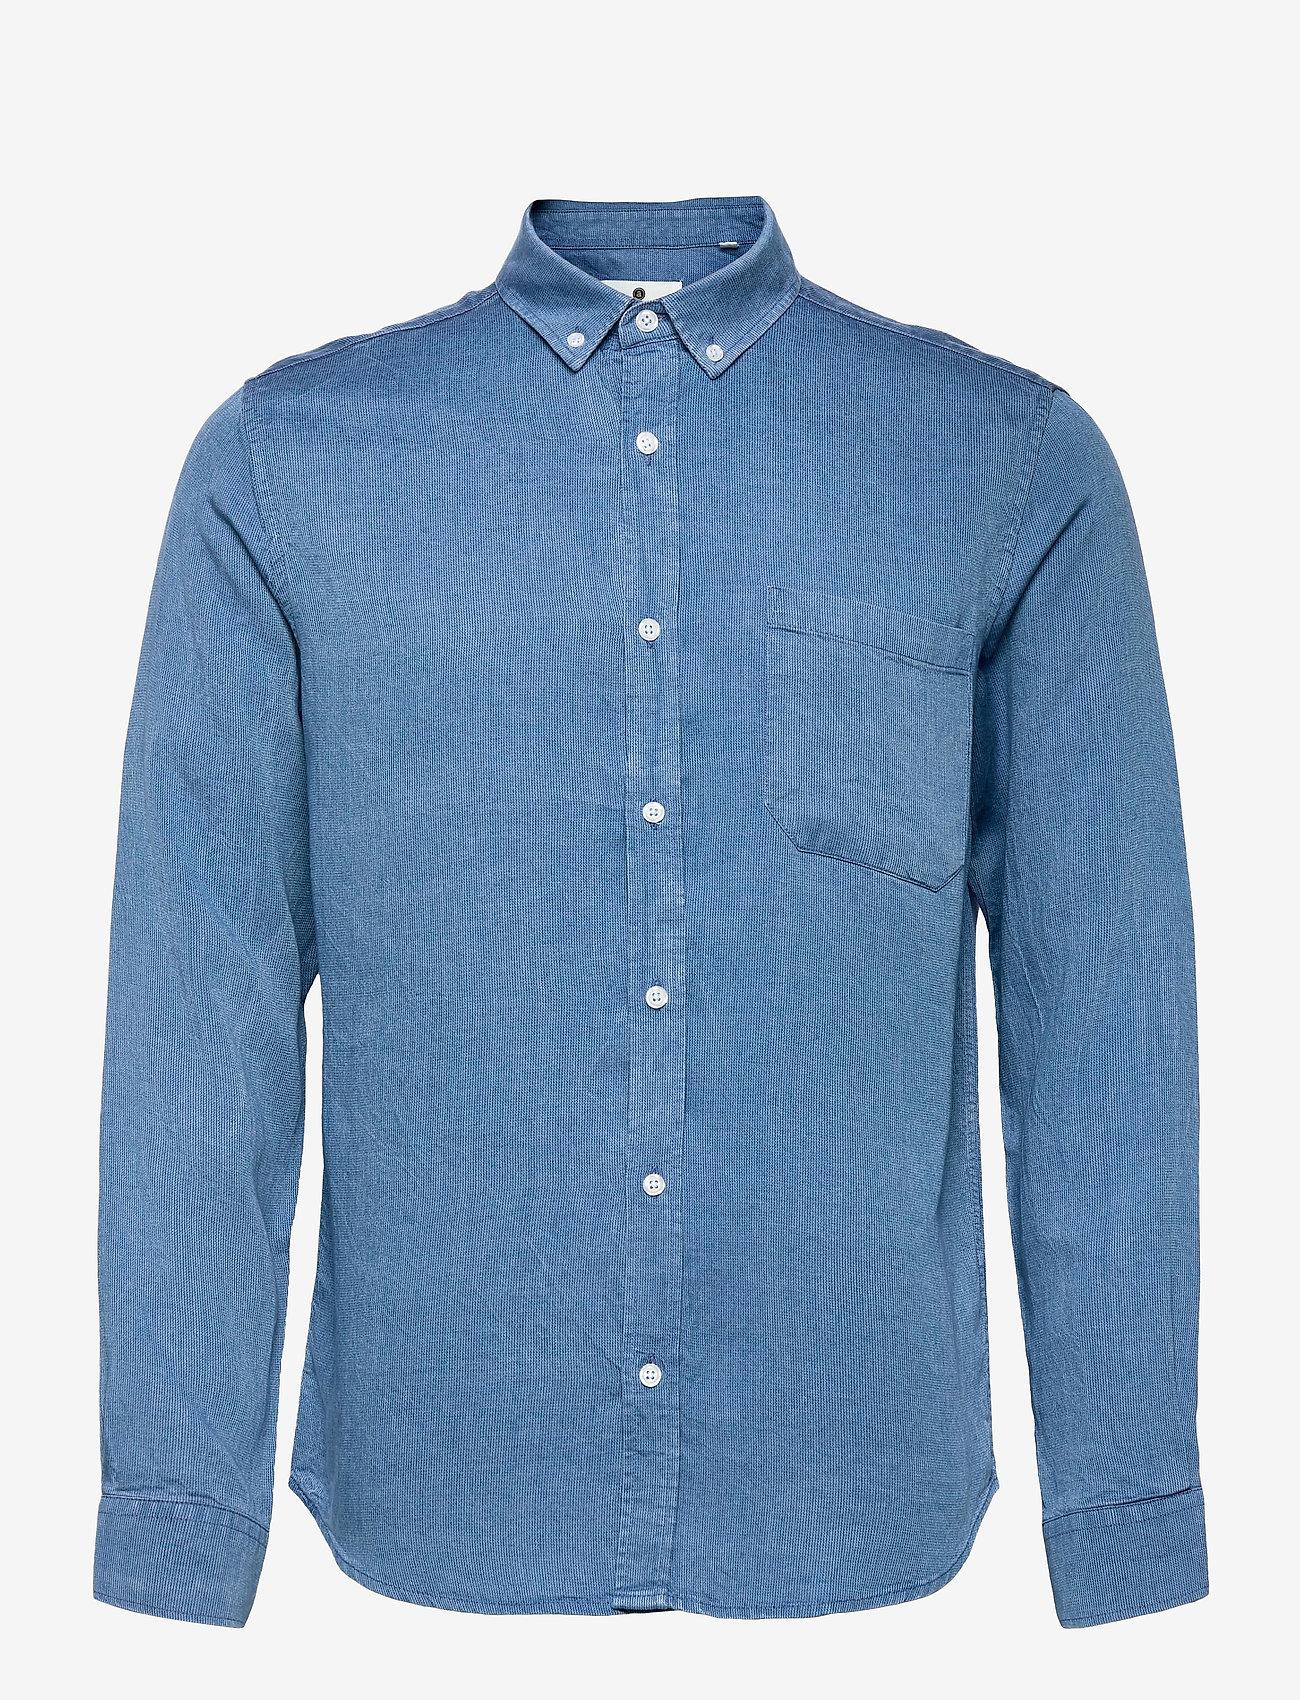 Anerkjendt - AKKONRAD LS TENSEL - linnen overhemden - copen blue - 1